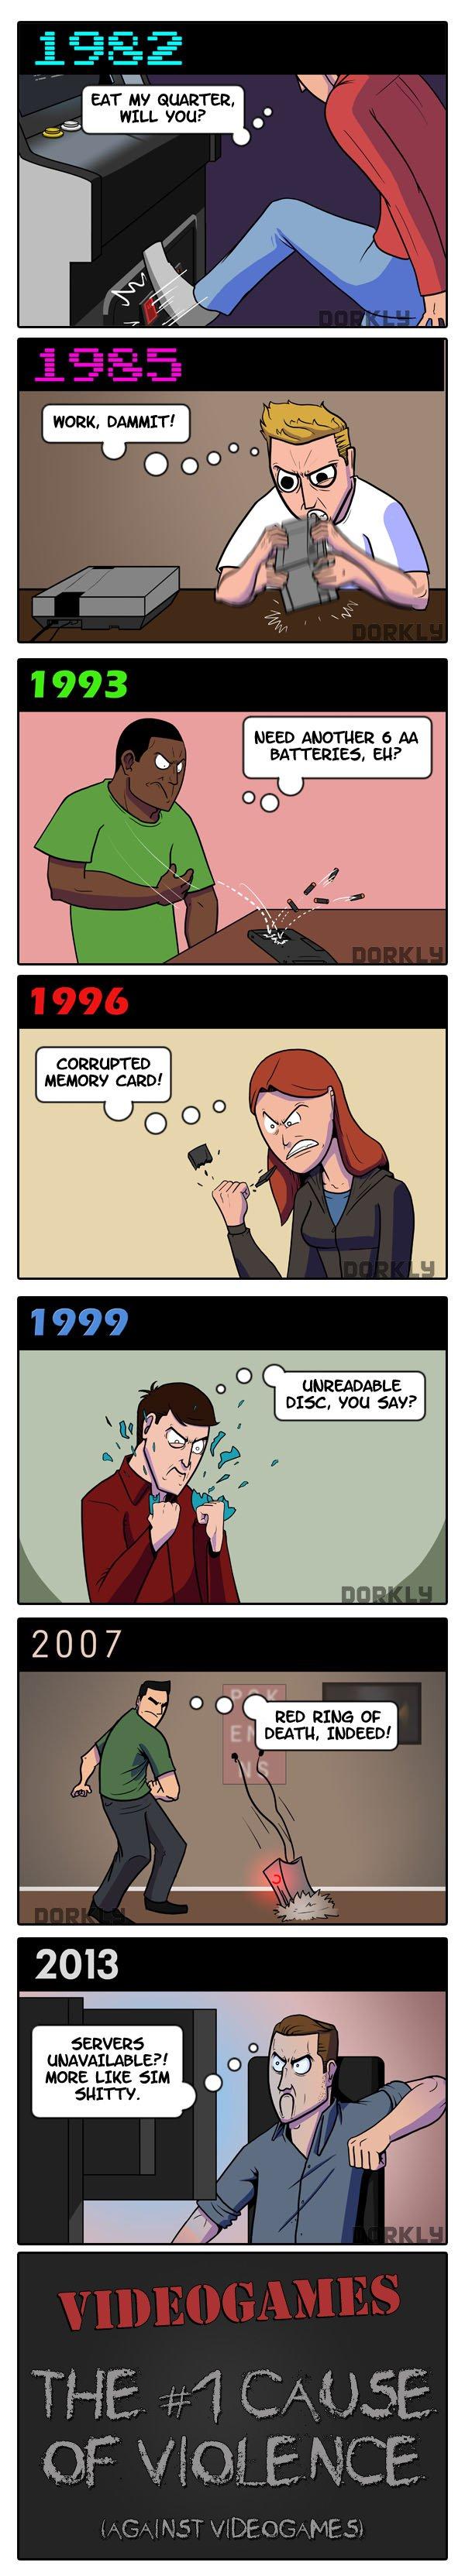 История насилия (против) видеоигр